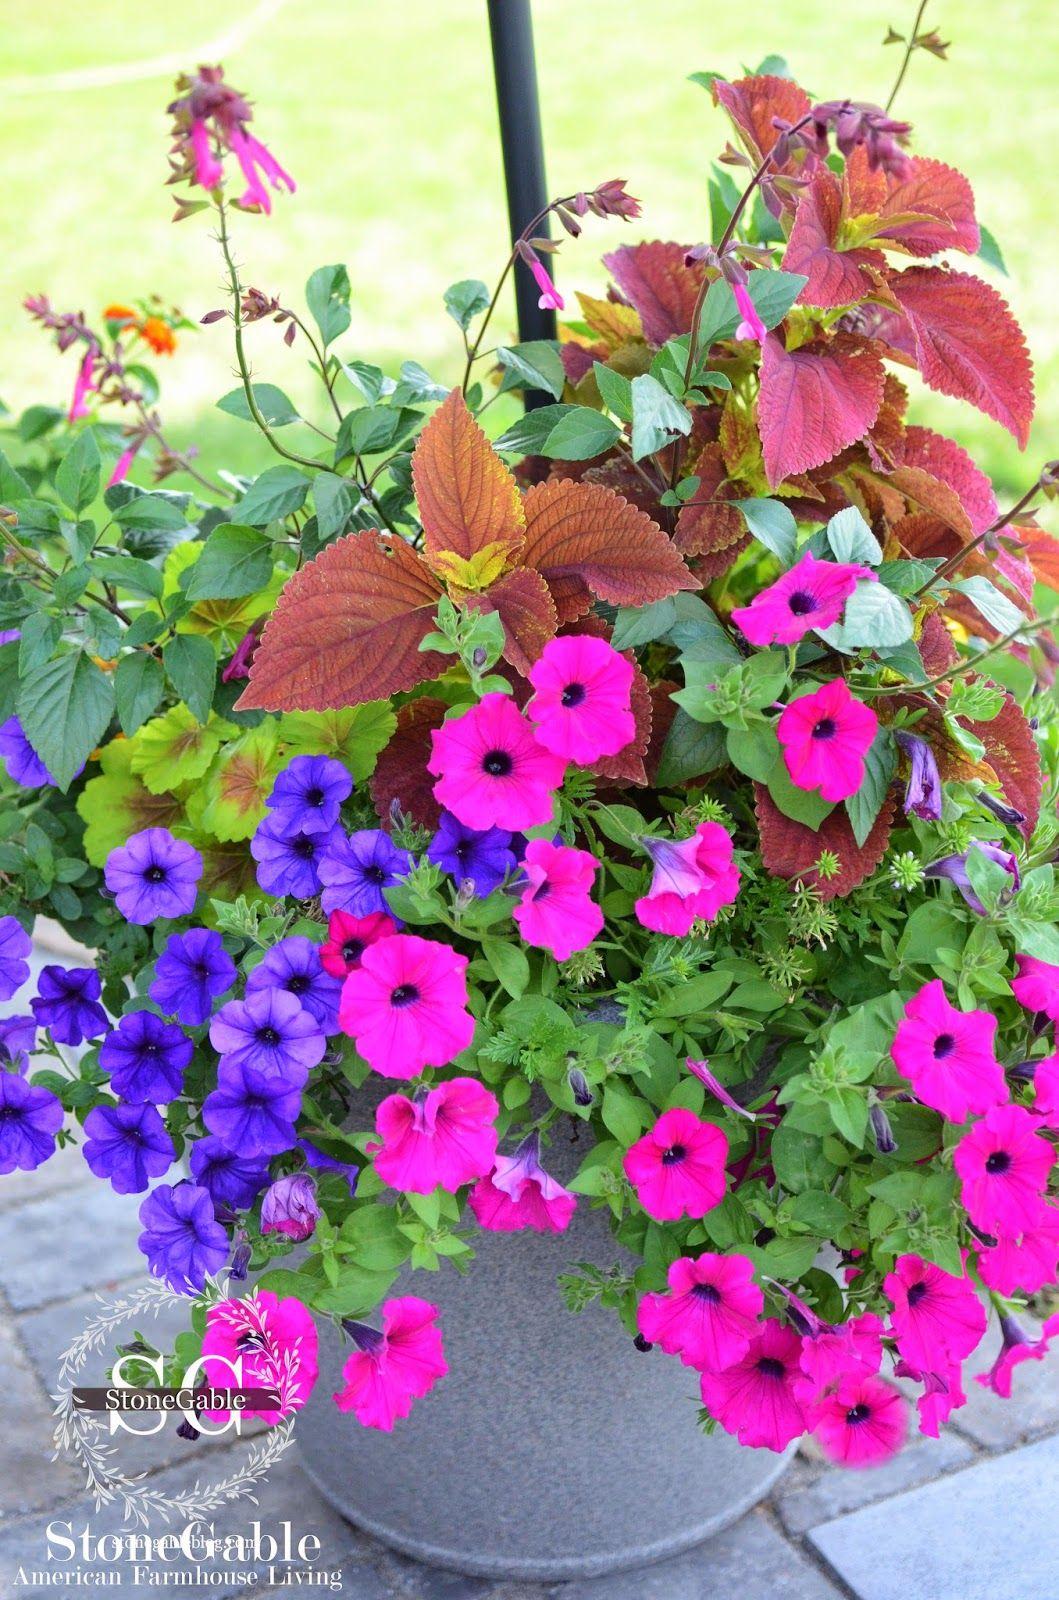 THE ANATOMY OF A FLOWER POT | Anatomy, Sweet potato vines and Potato ...